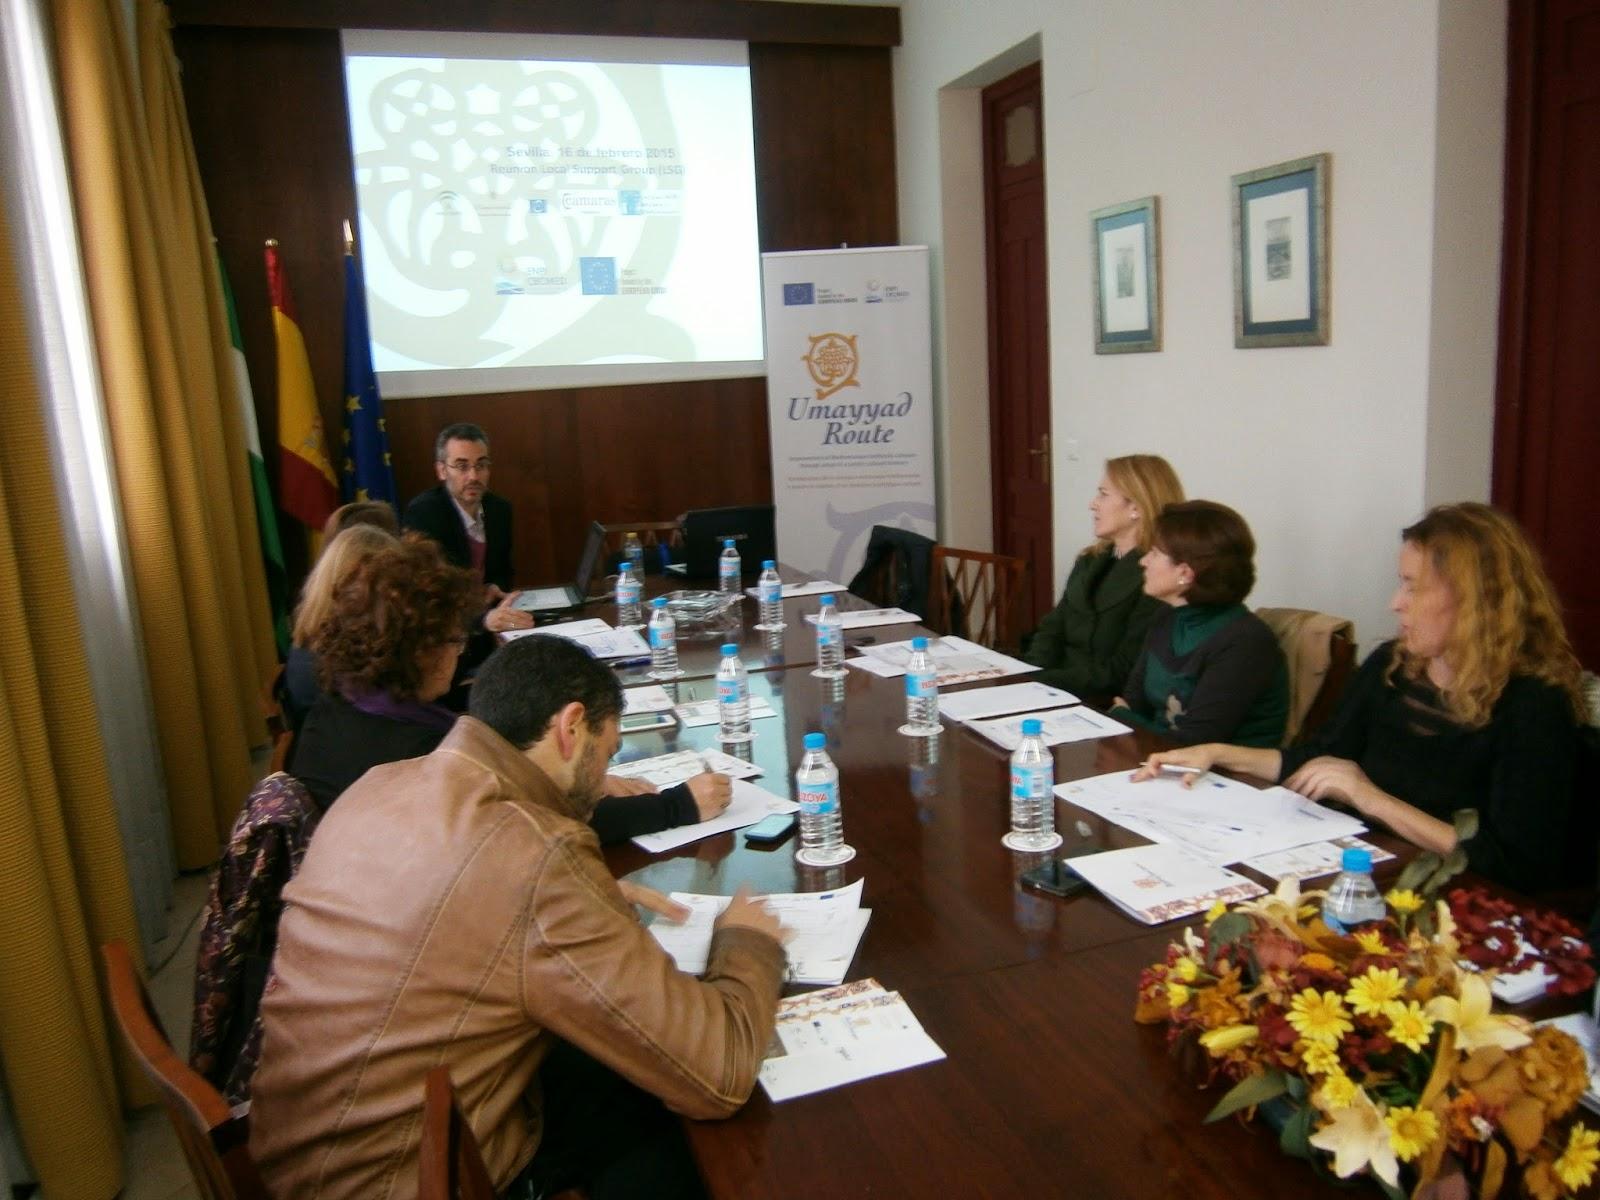 Oficina de turismo de carmona carmona participa en el for Oficina turismo cordoba